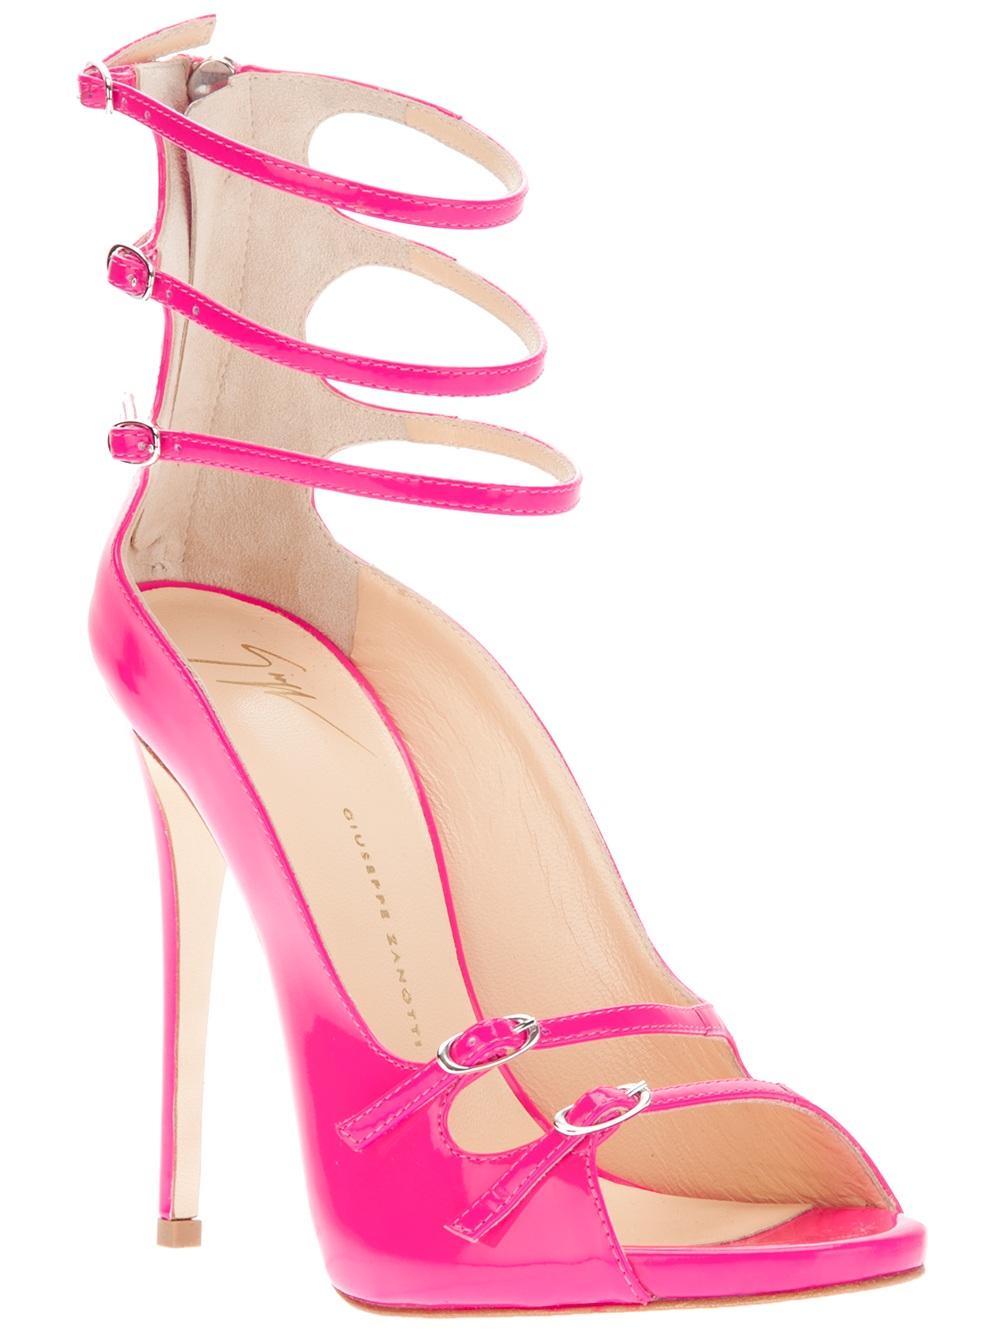 Giuseppe zanotti Strappy Sandal in Pink | Lyst